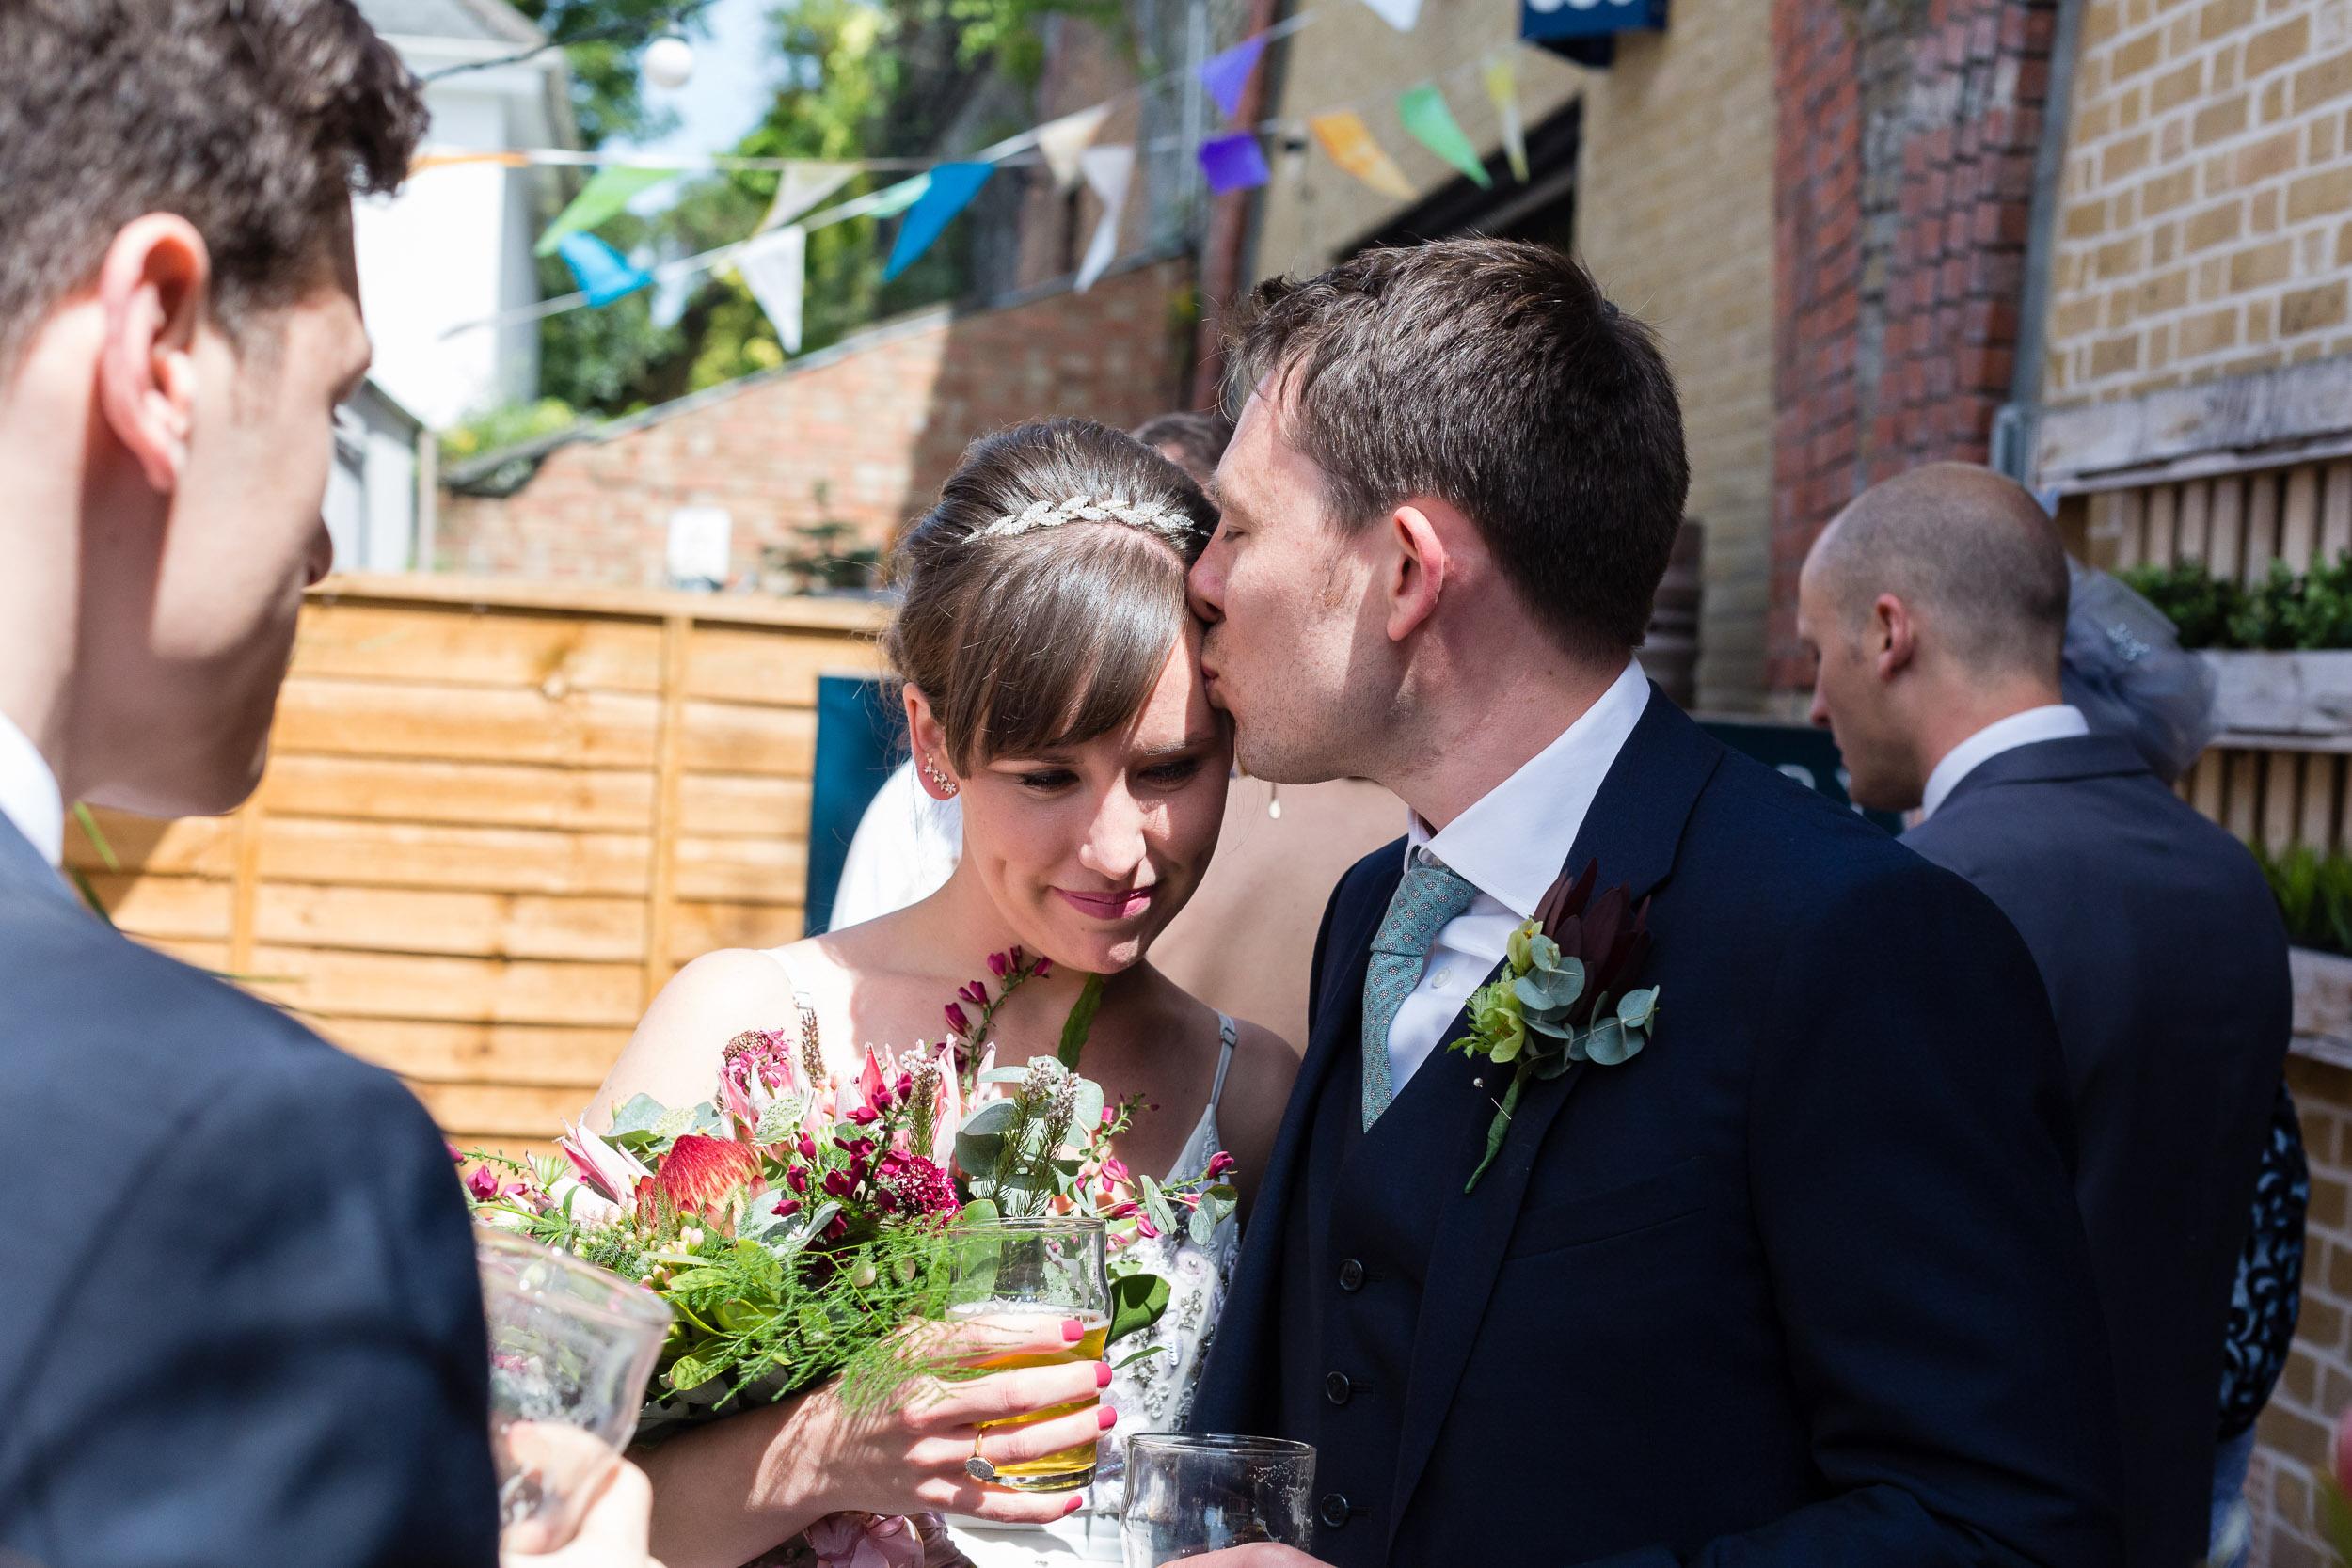 brockwell-lido-brixton-herne-hill-wedding-065.jpg